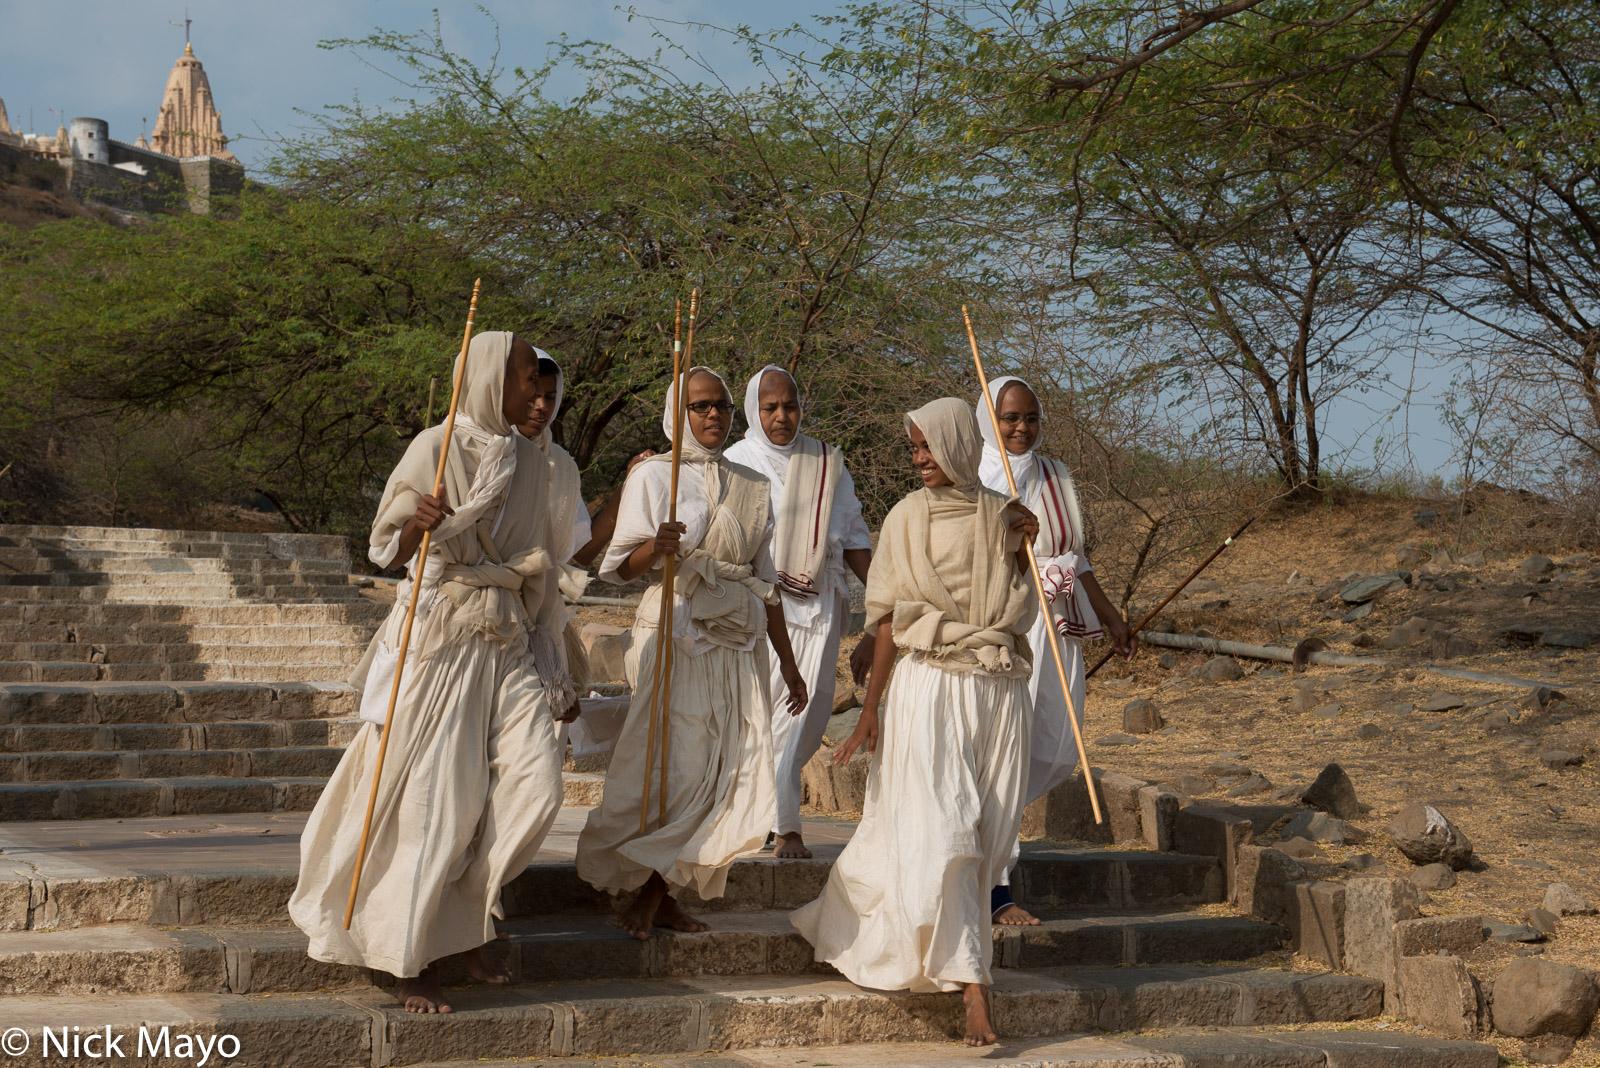 A group of Jain nuns descending from the Shatrunjaya Hill temple complex at Palitana.